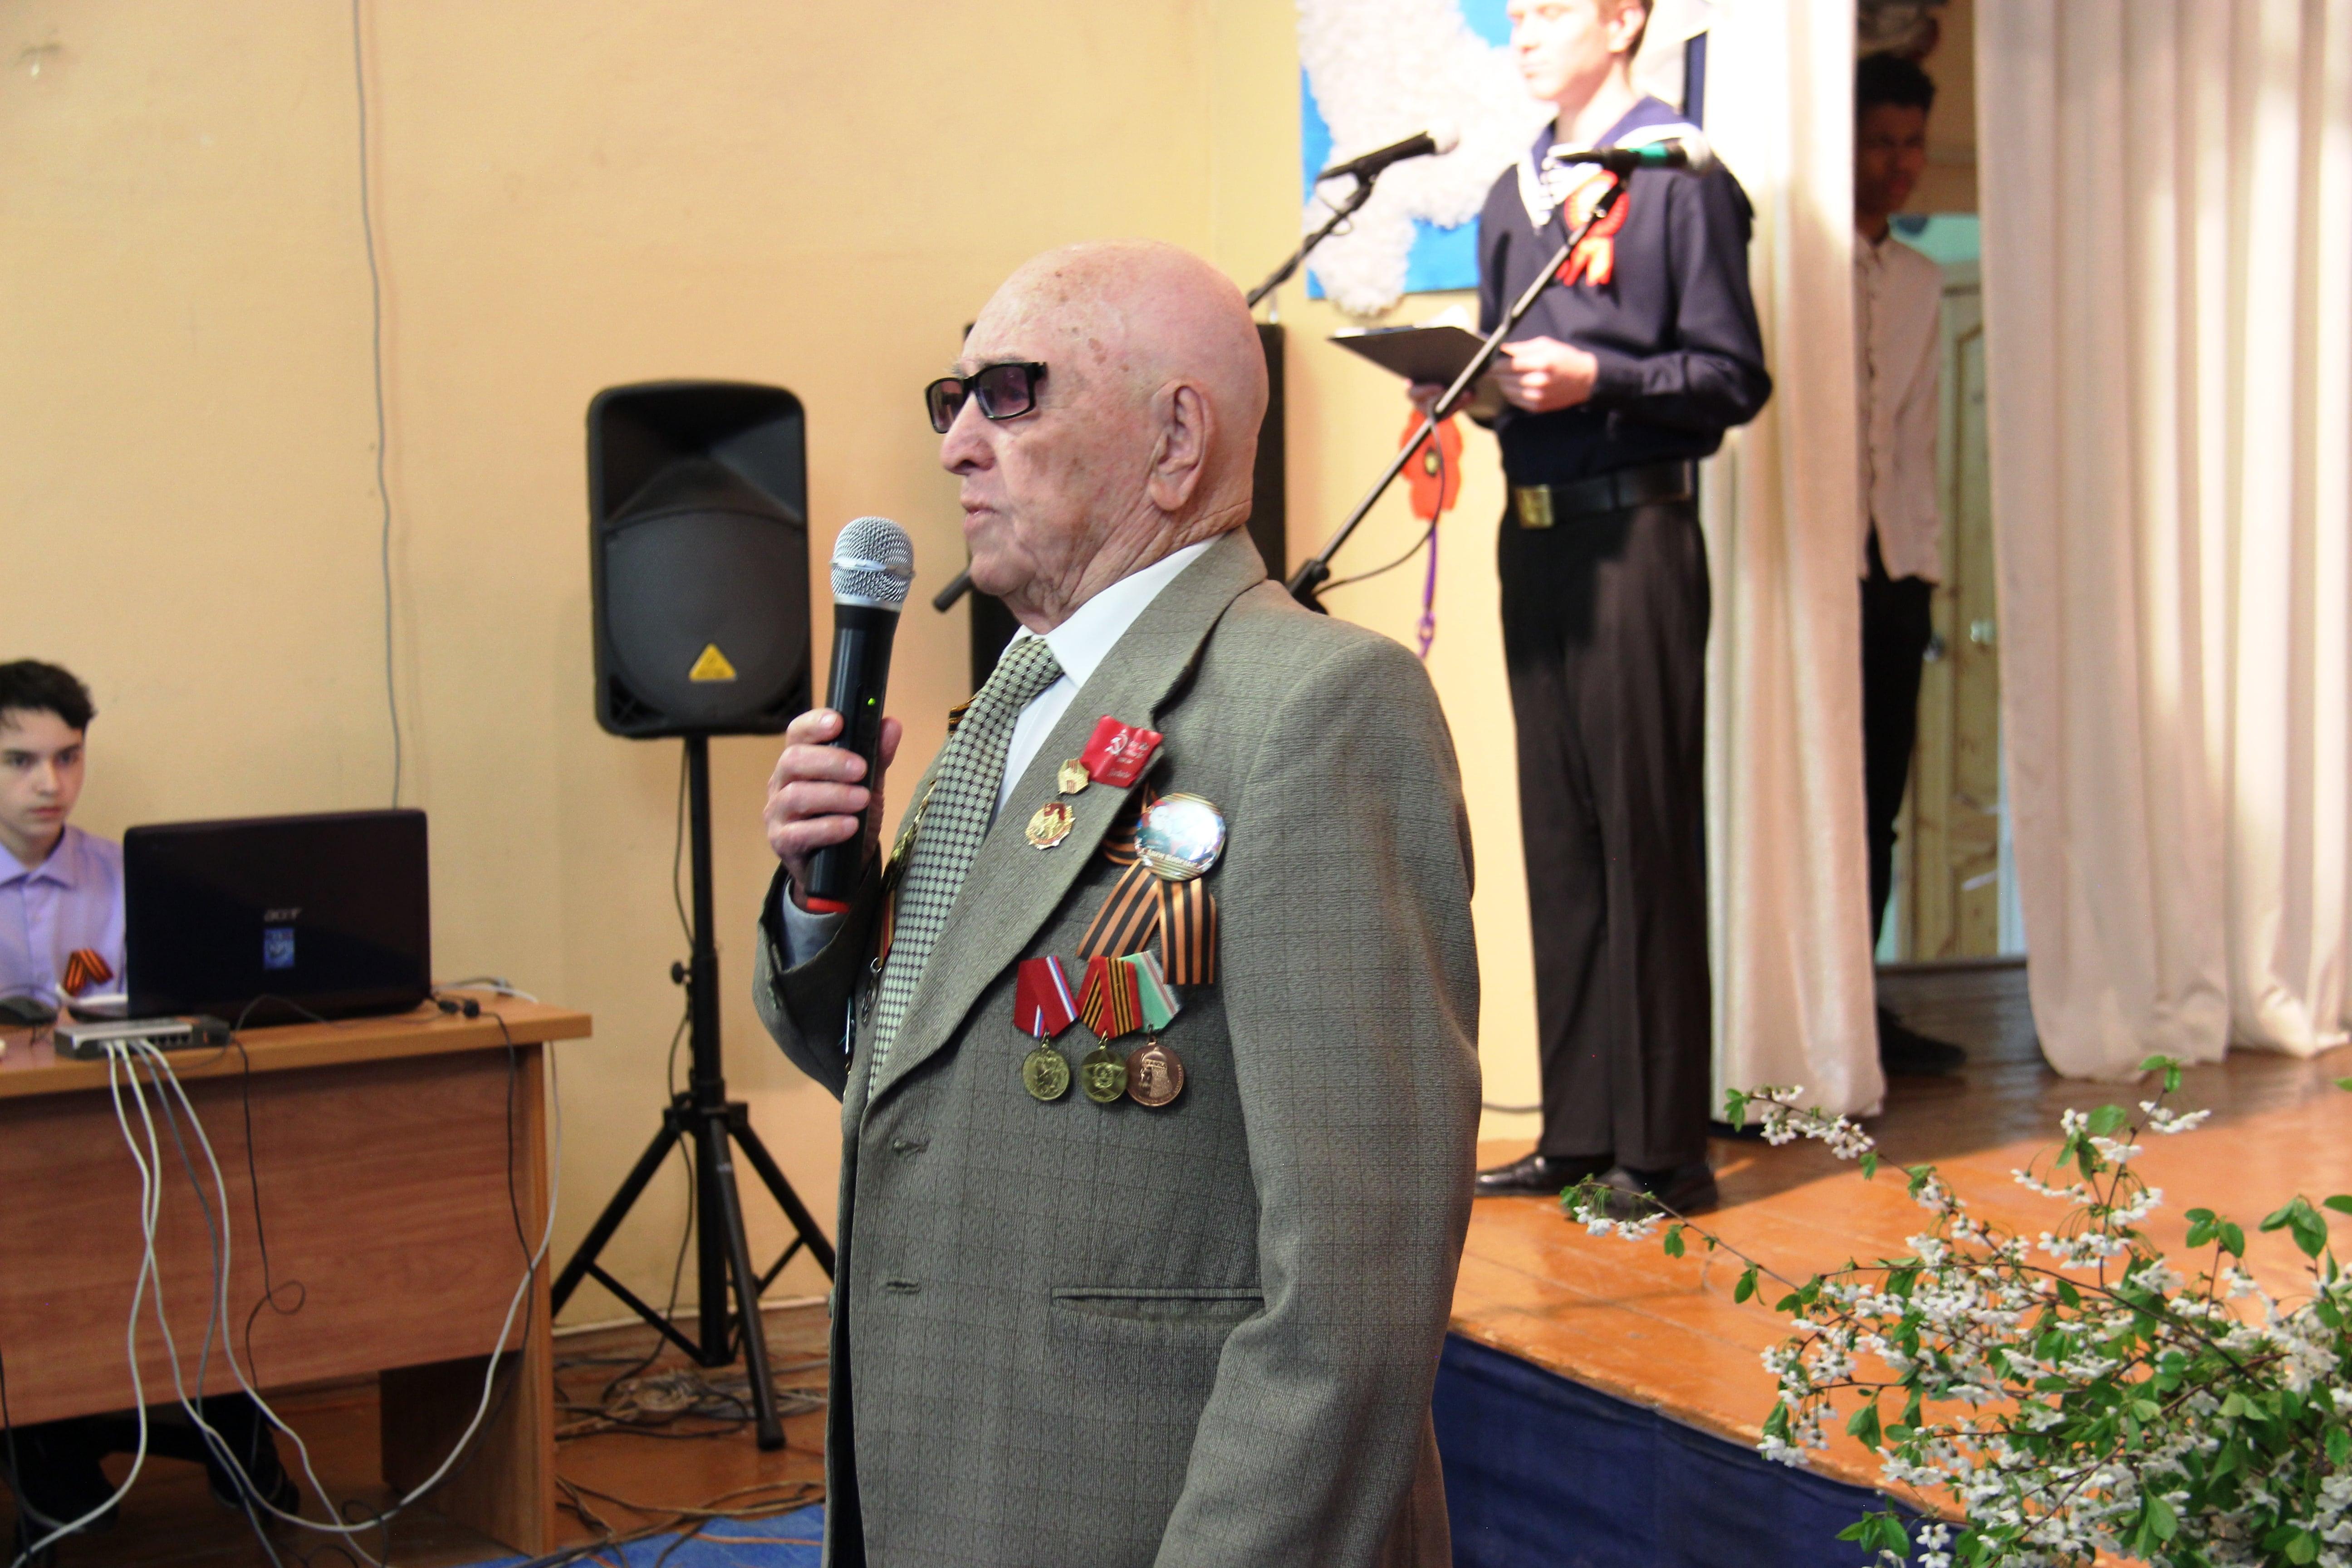 http://monuspen.ru/photoreports/b3afe9db7b5af7083492e2c5aff7c174.JPG